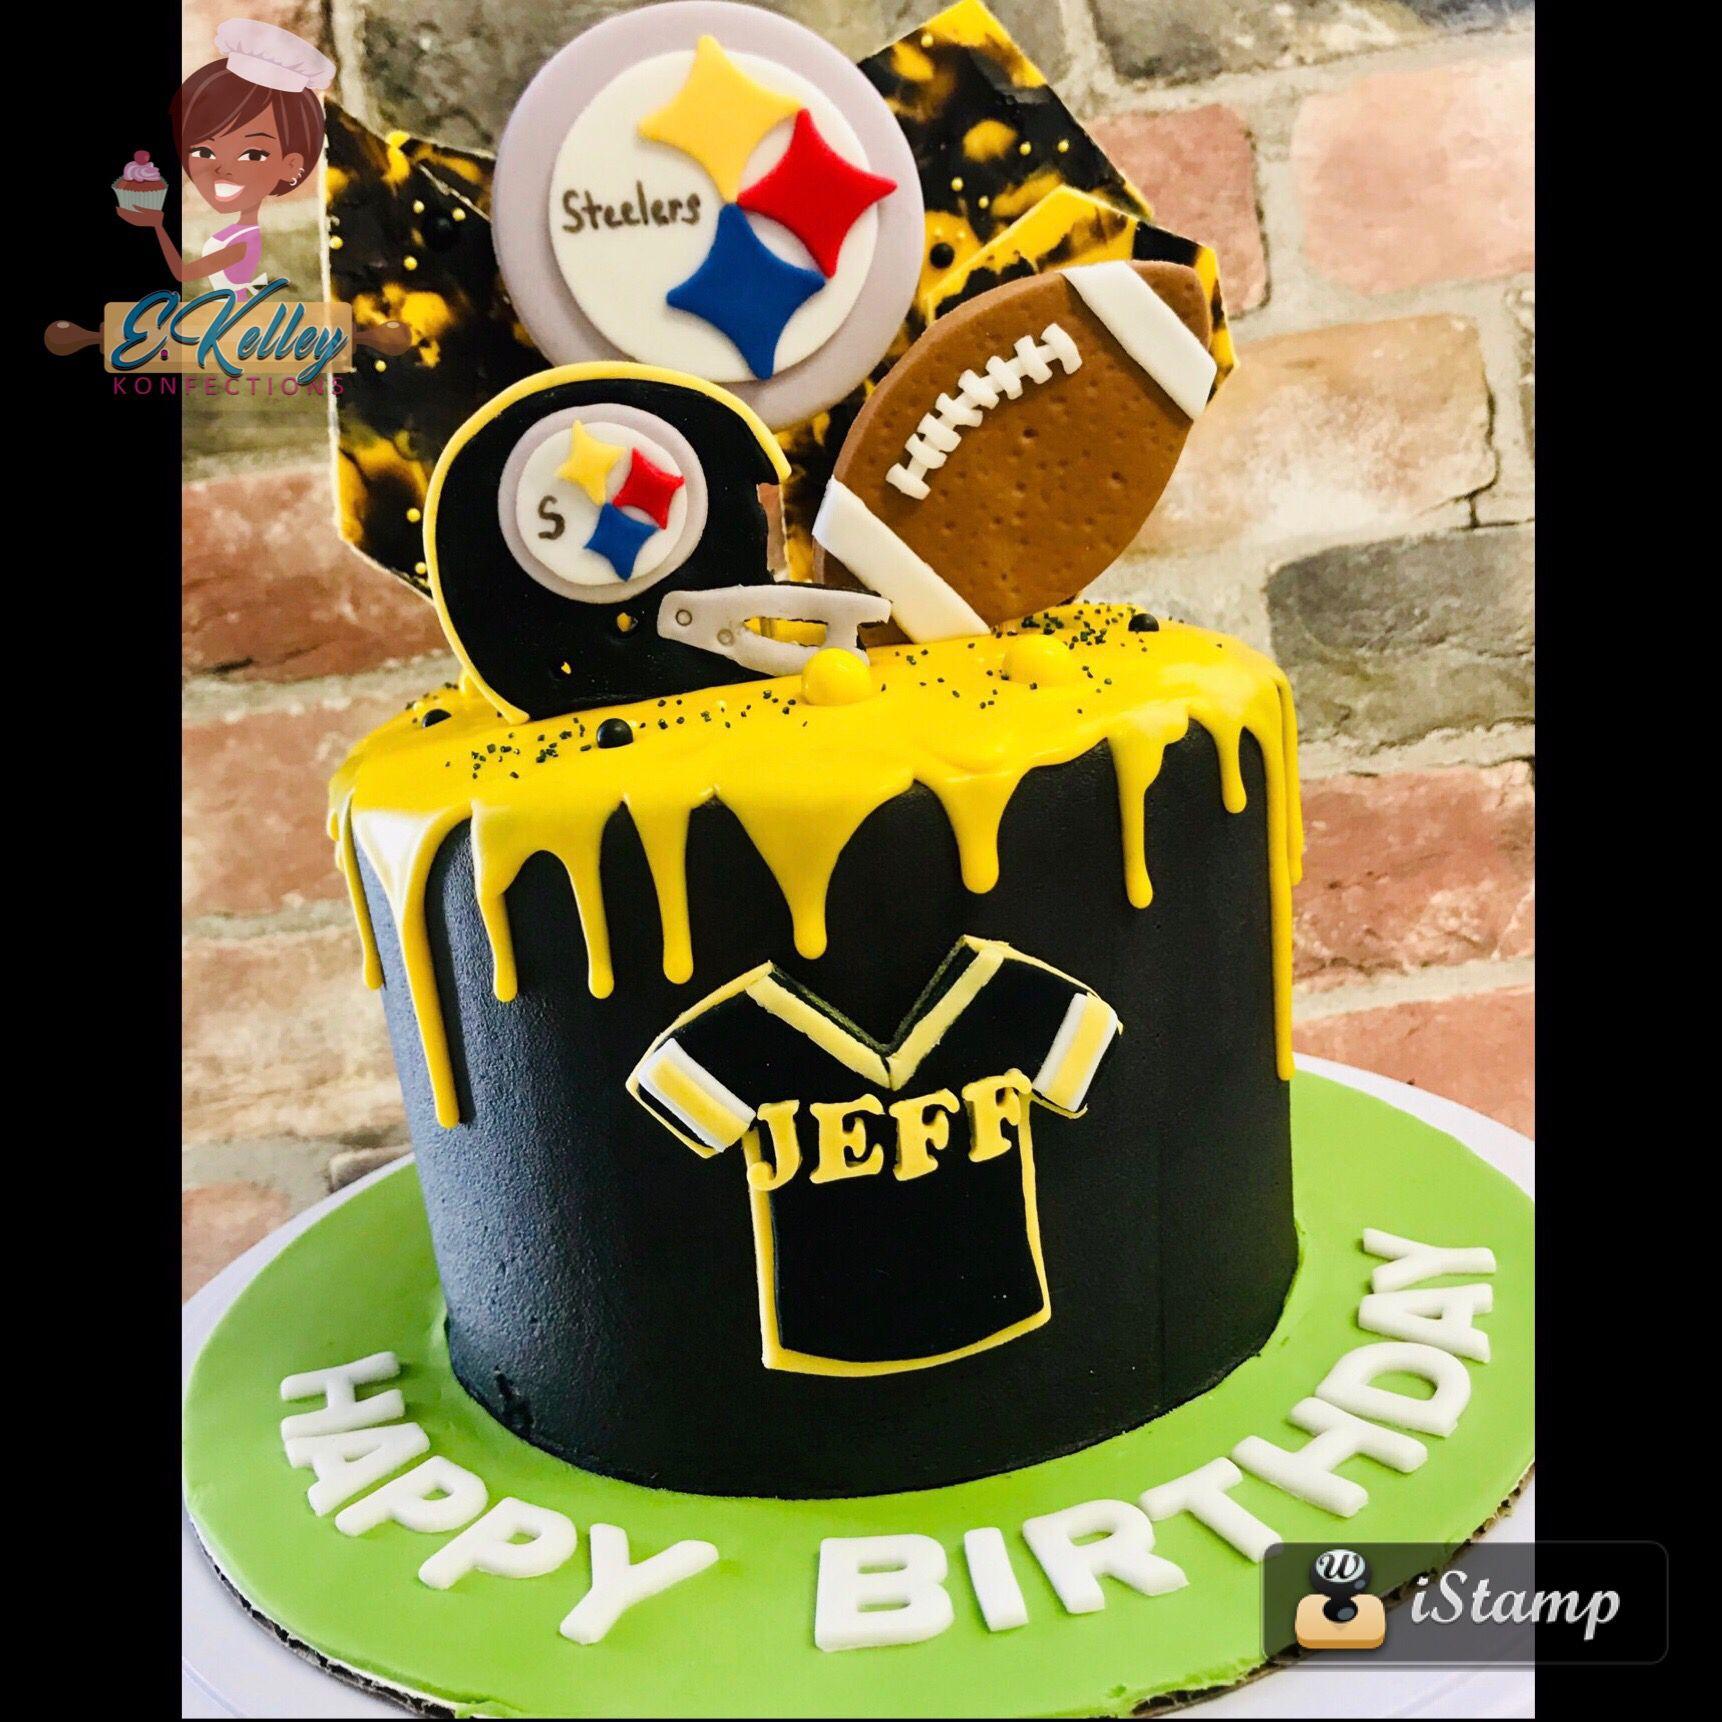 Drip Cake Football Cake Steelers Cake Cake Drip Cakes Football Cake